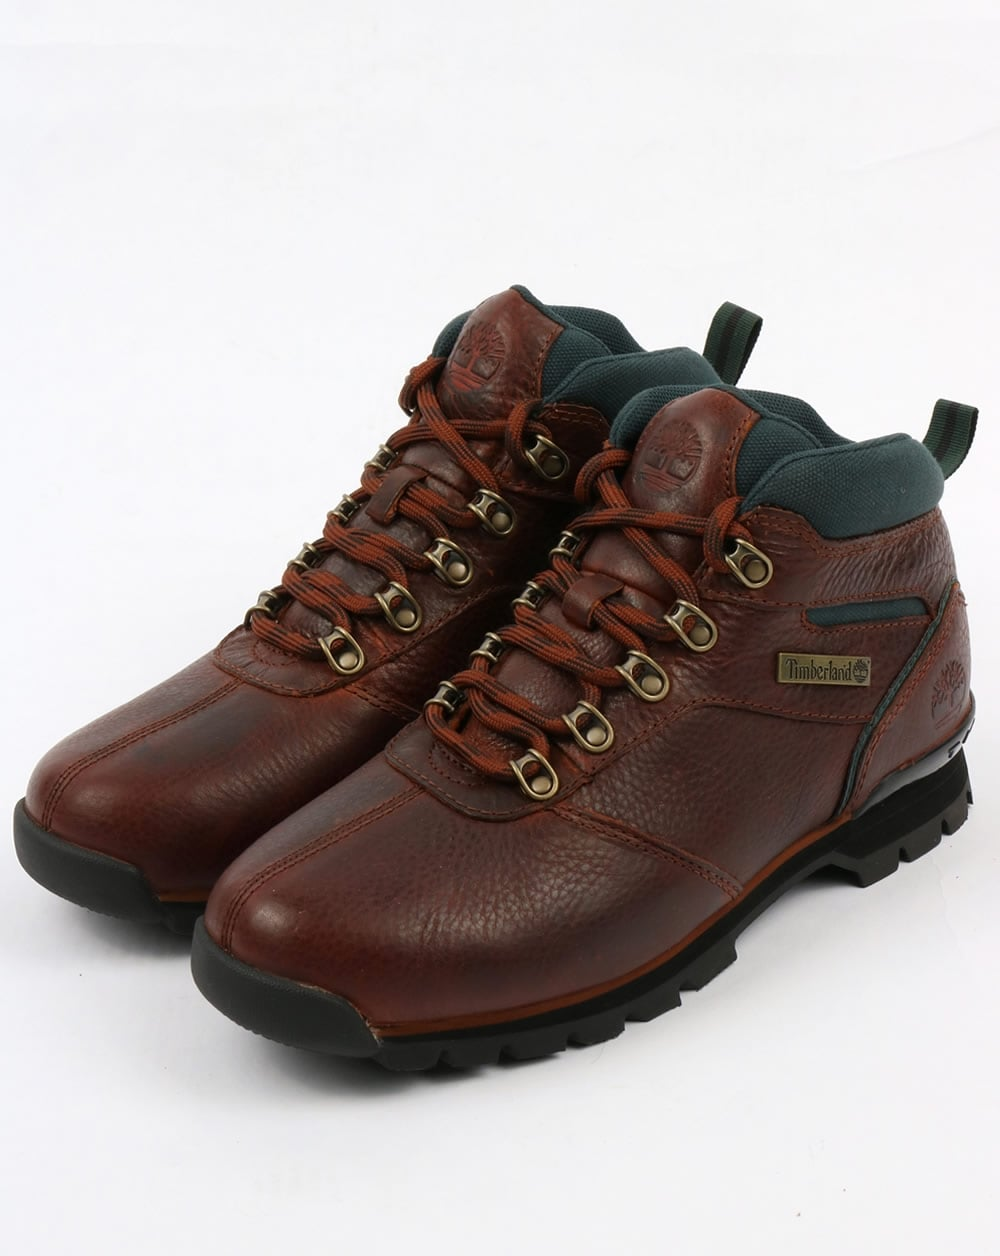 reasonable price release date: quality design Timberland Splitrock II Boots Brown/Green